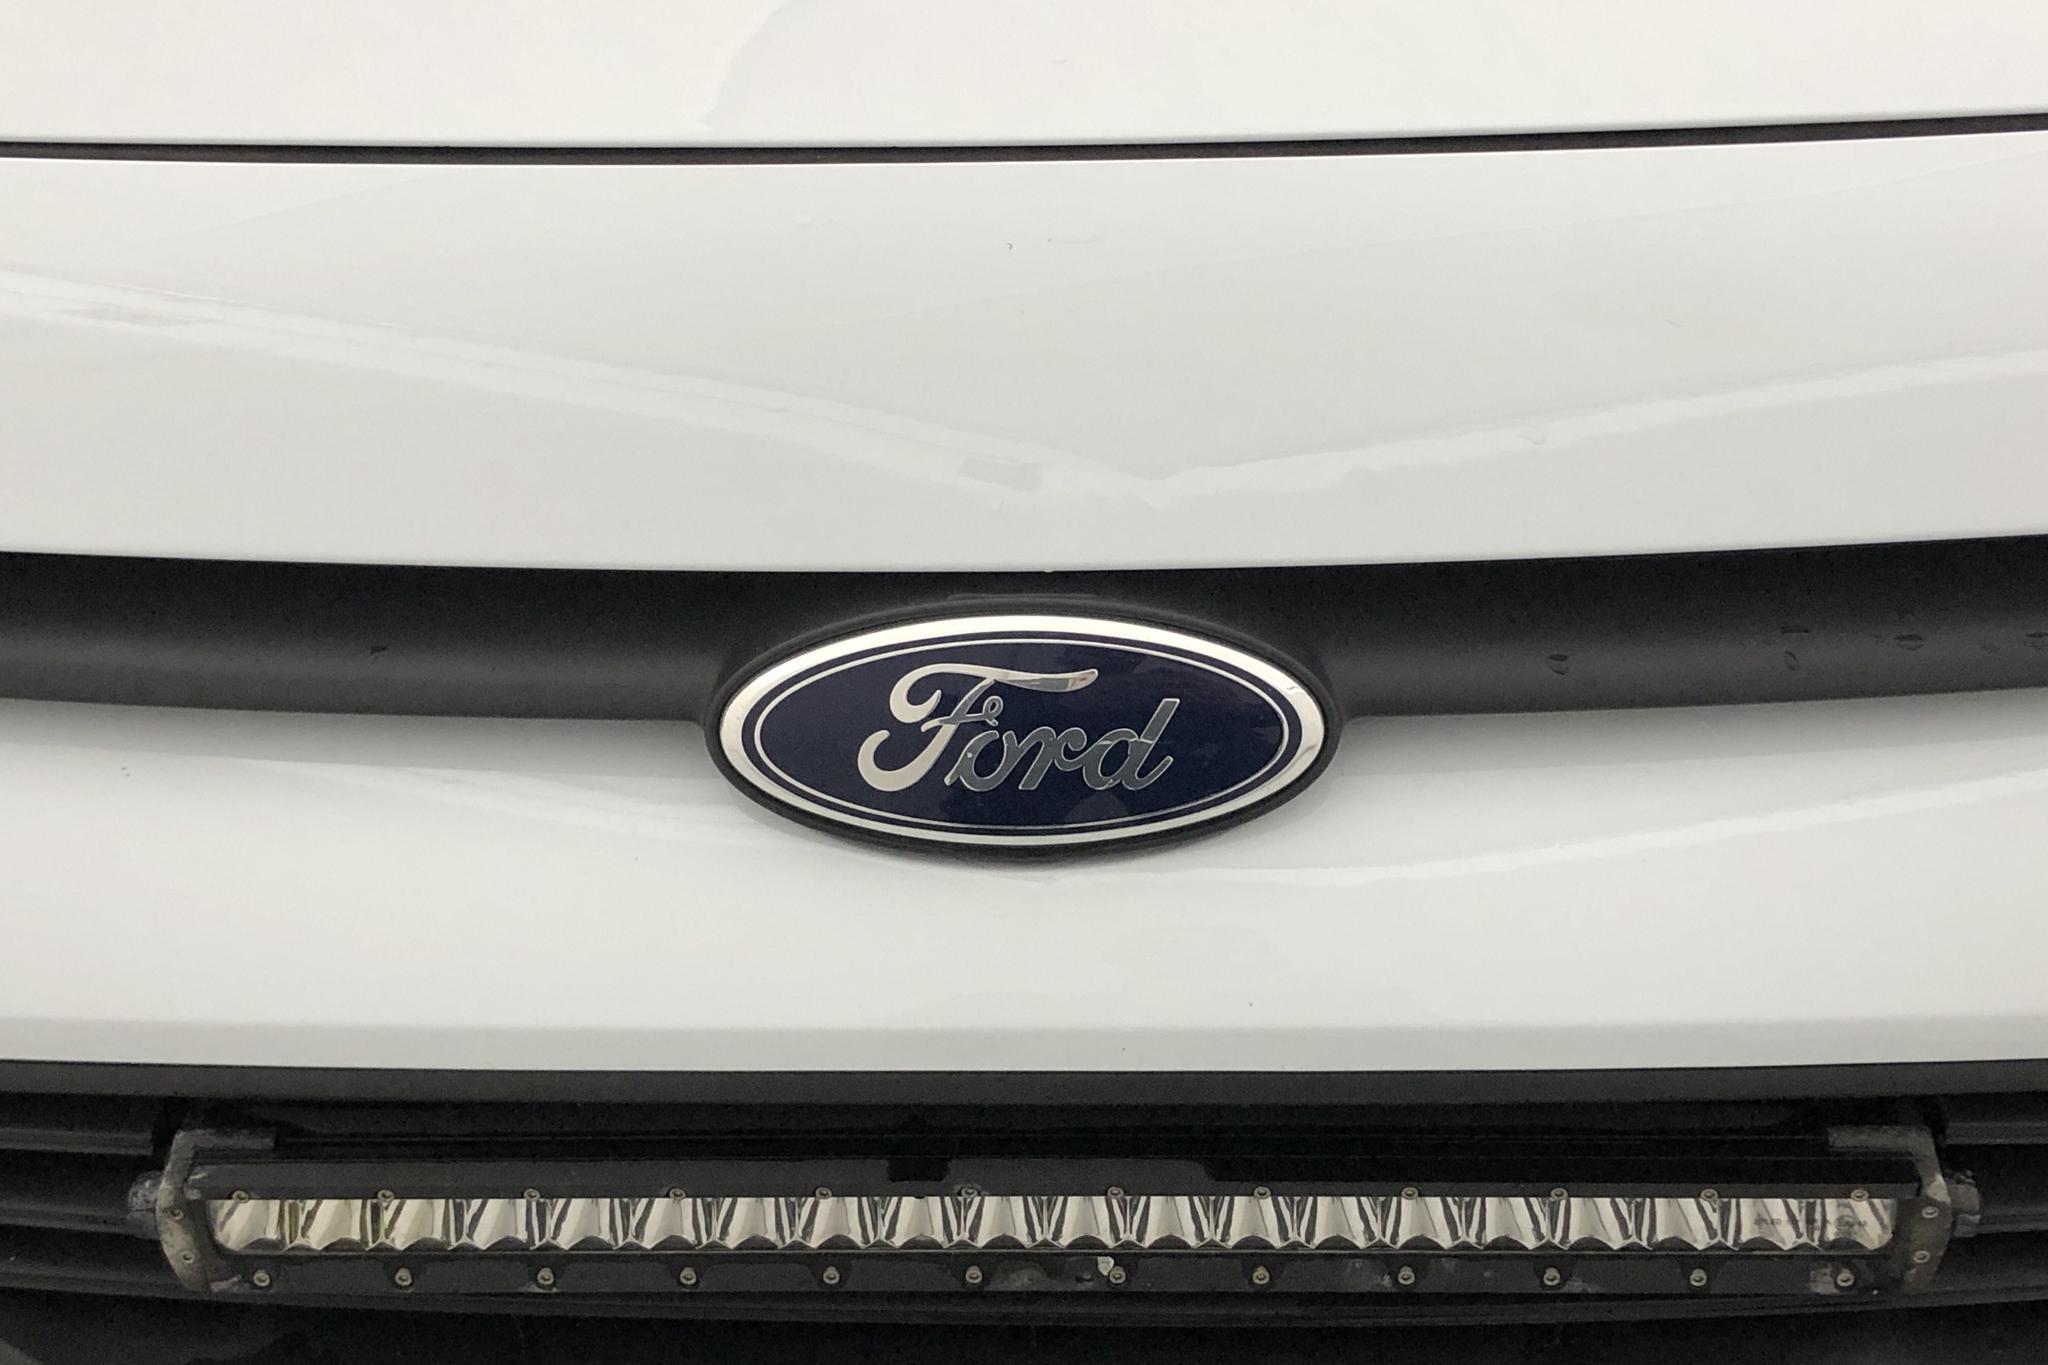 Ford Transit Connect 1.5 TDCi (100hk) - 74 660 km - Manual - white - 2017